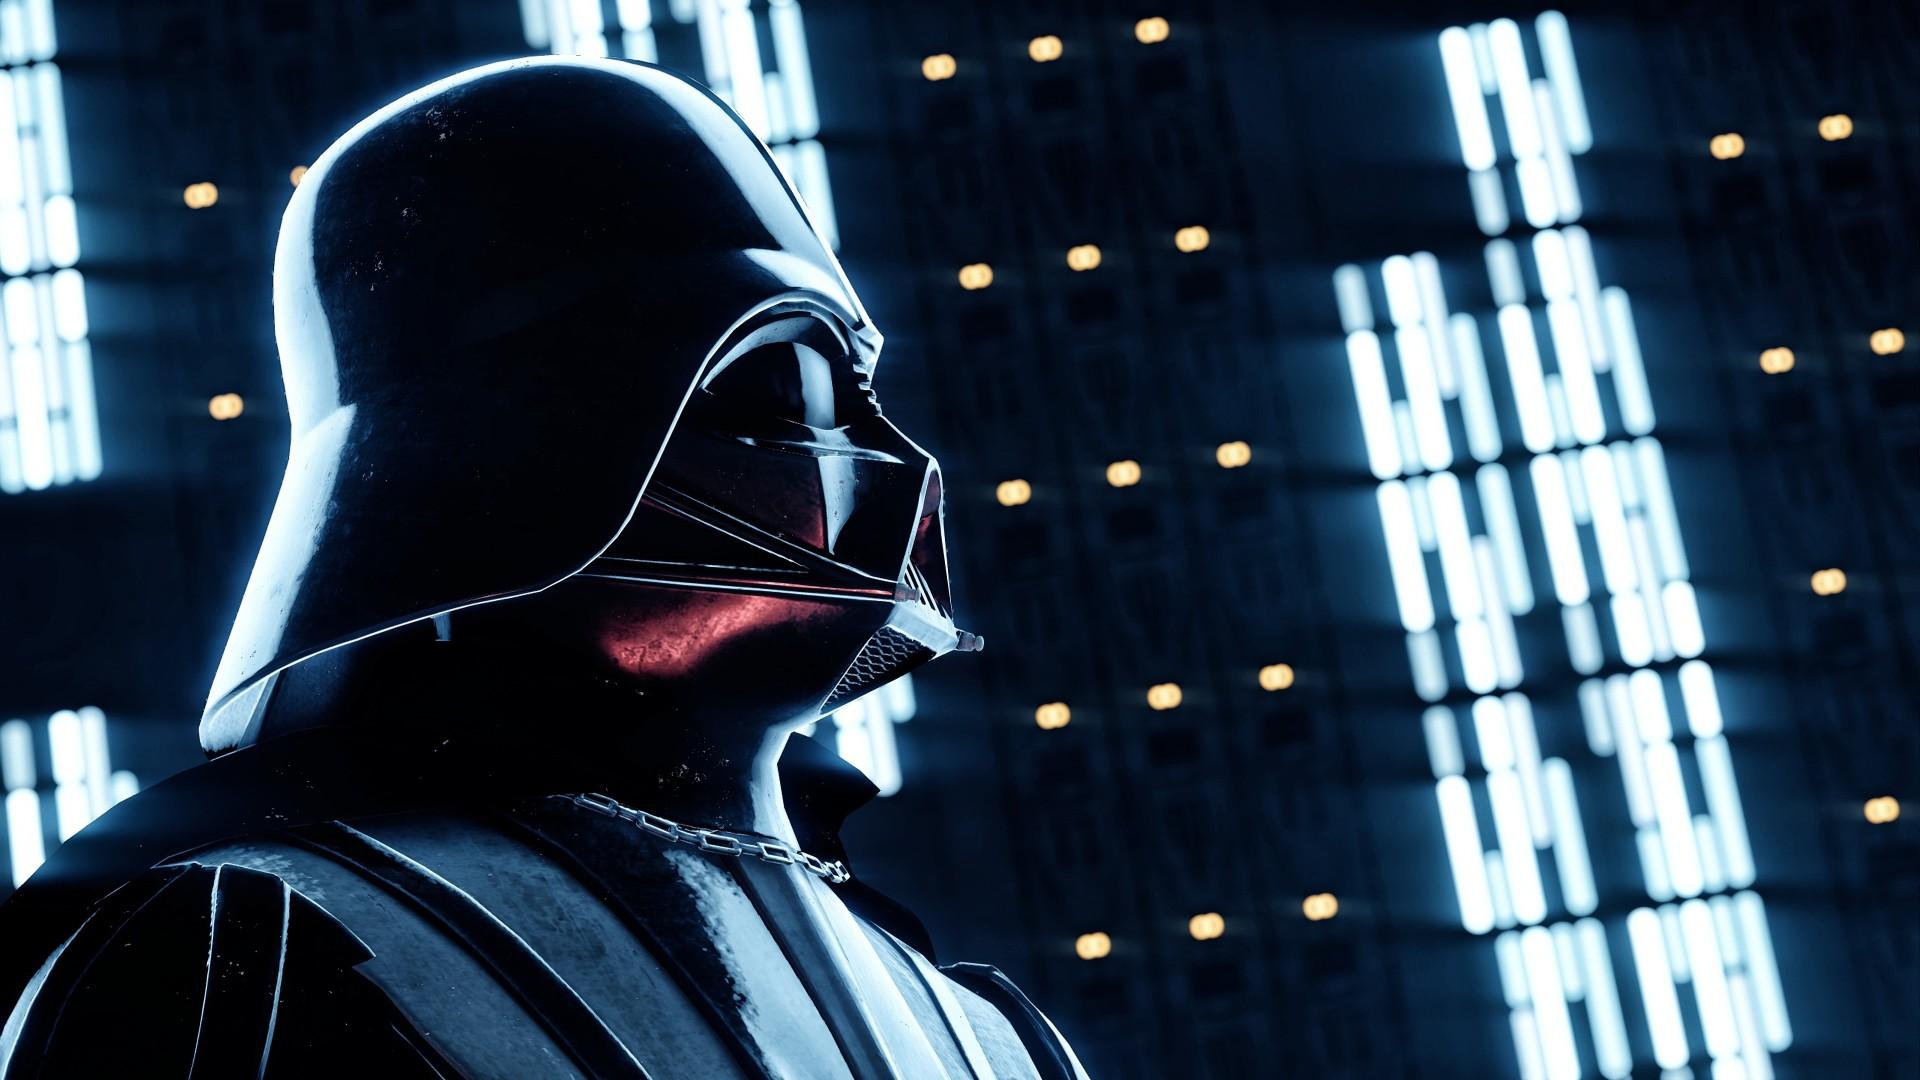 Darth Vader Profile 1920x1080 1080p Wallpaper Thewallpaperkid Com